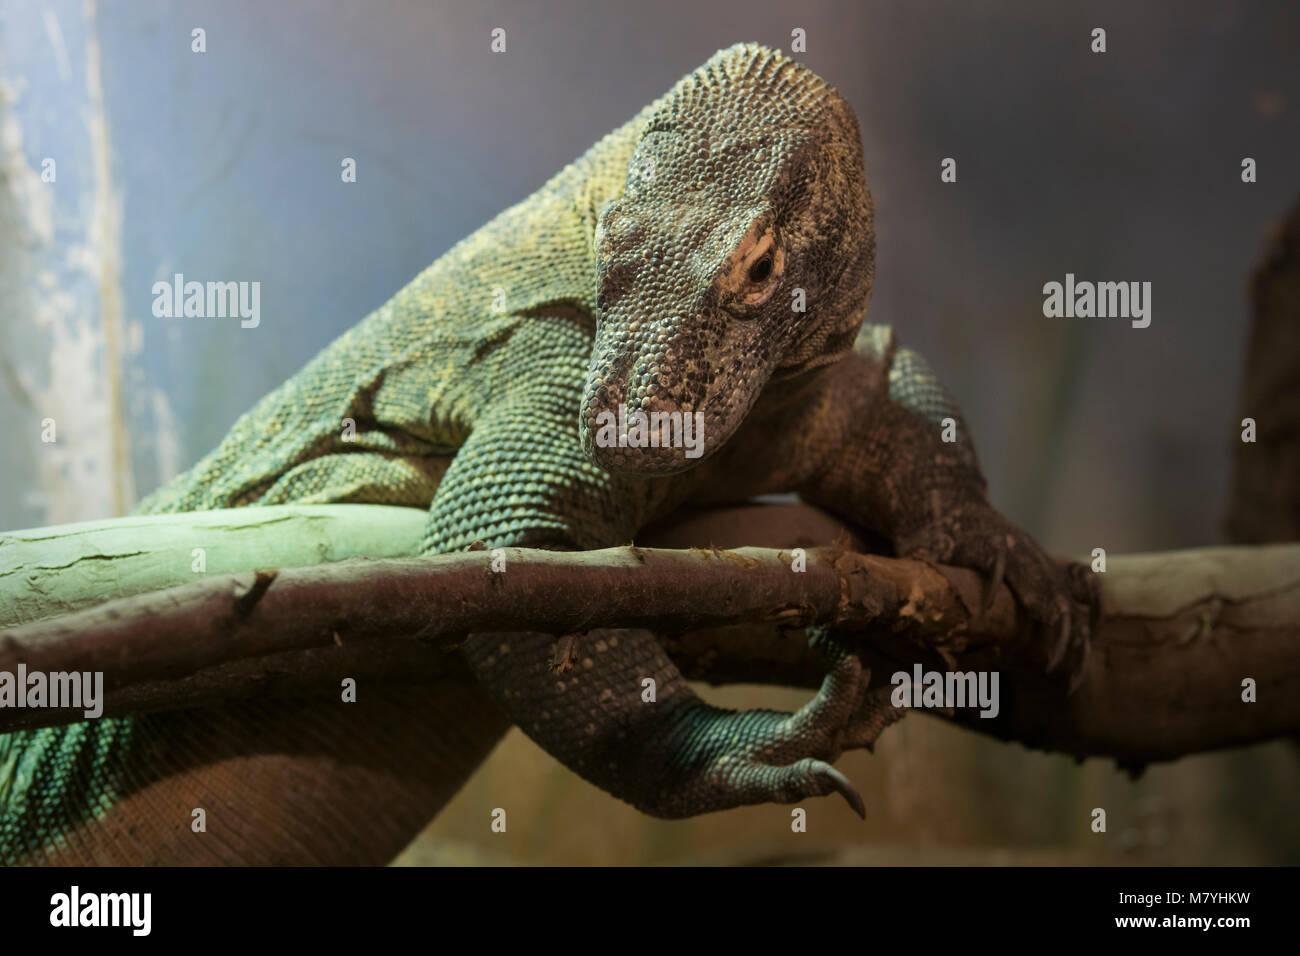 Komodo dragon in a terrarium Stock Photo